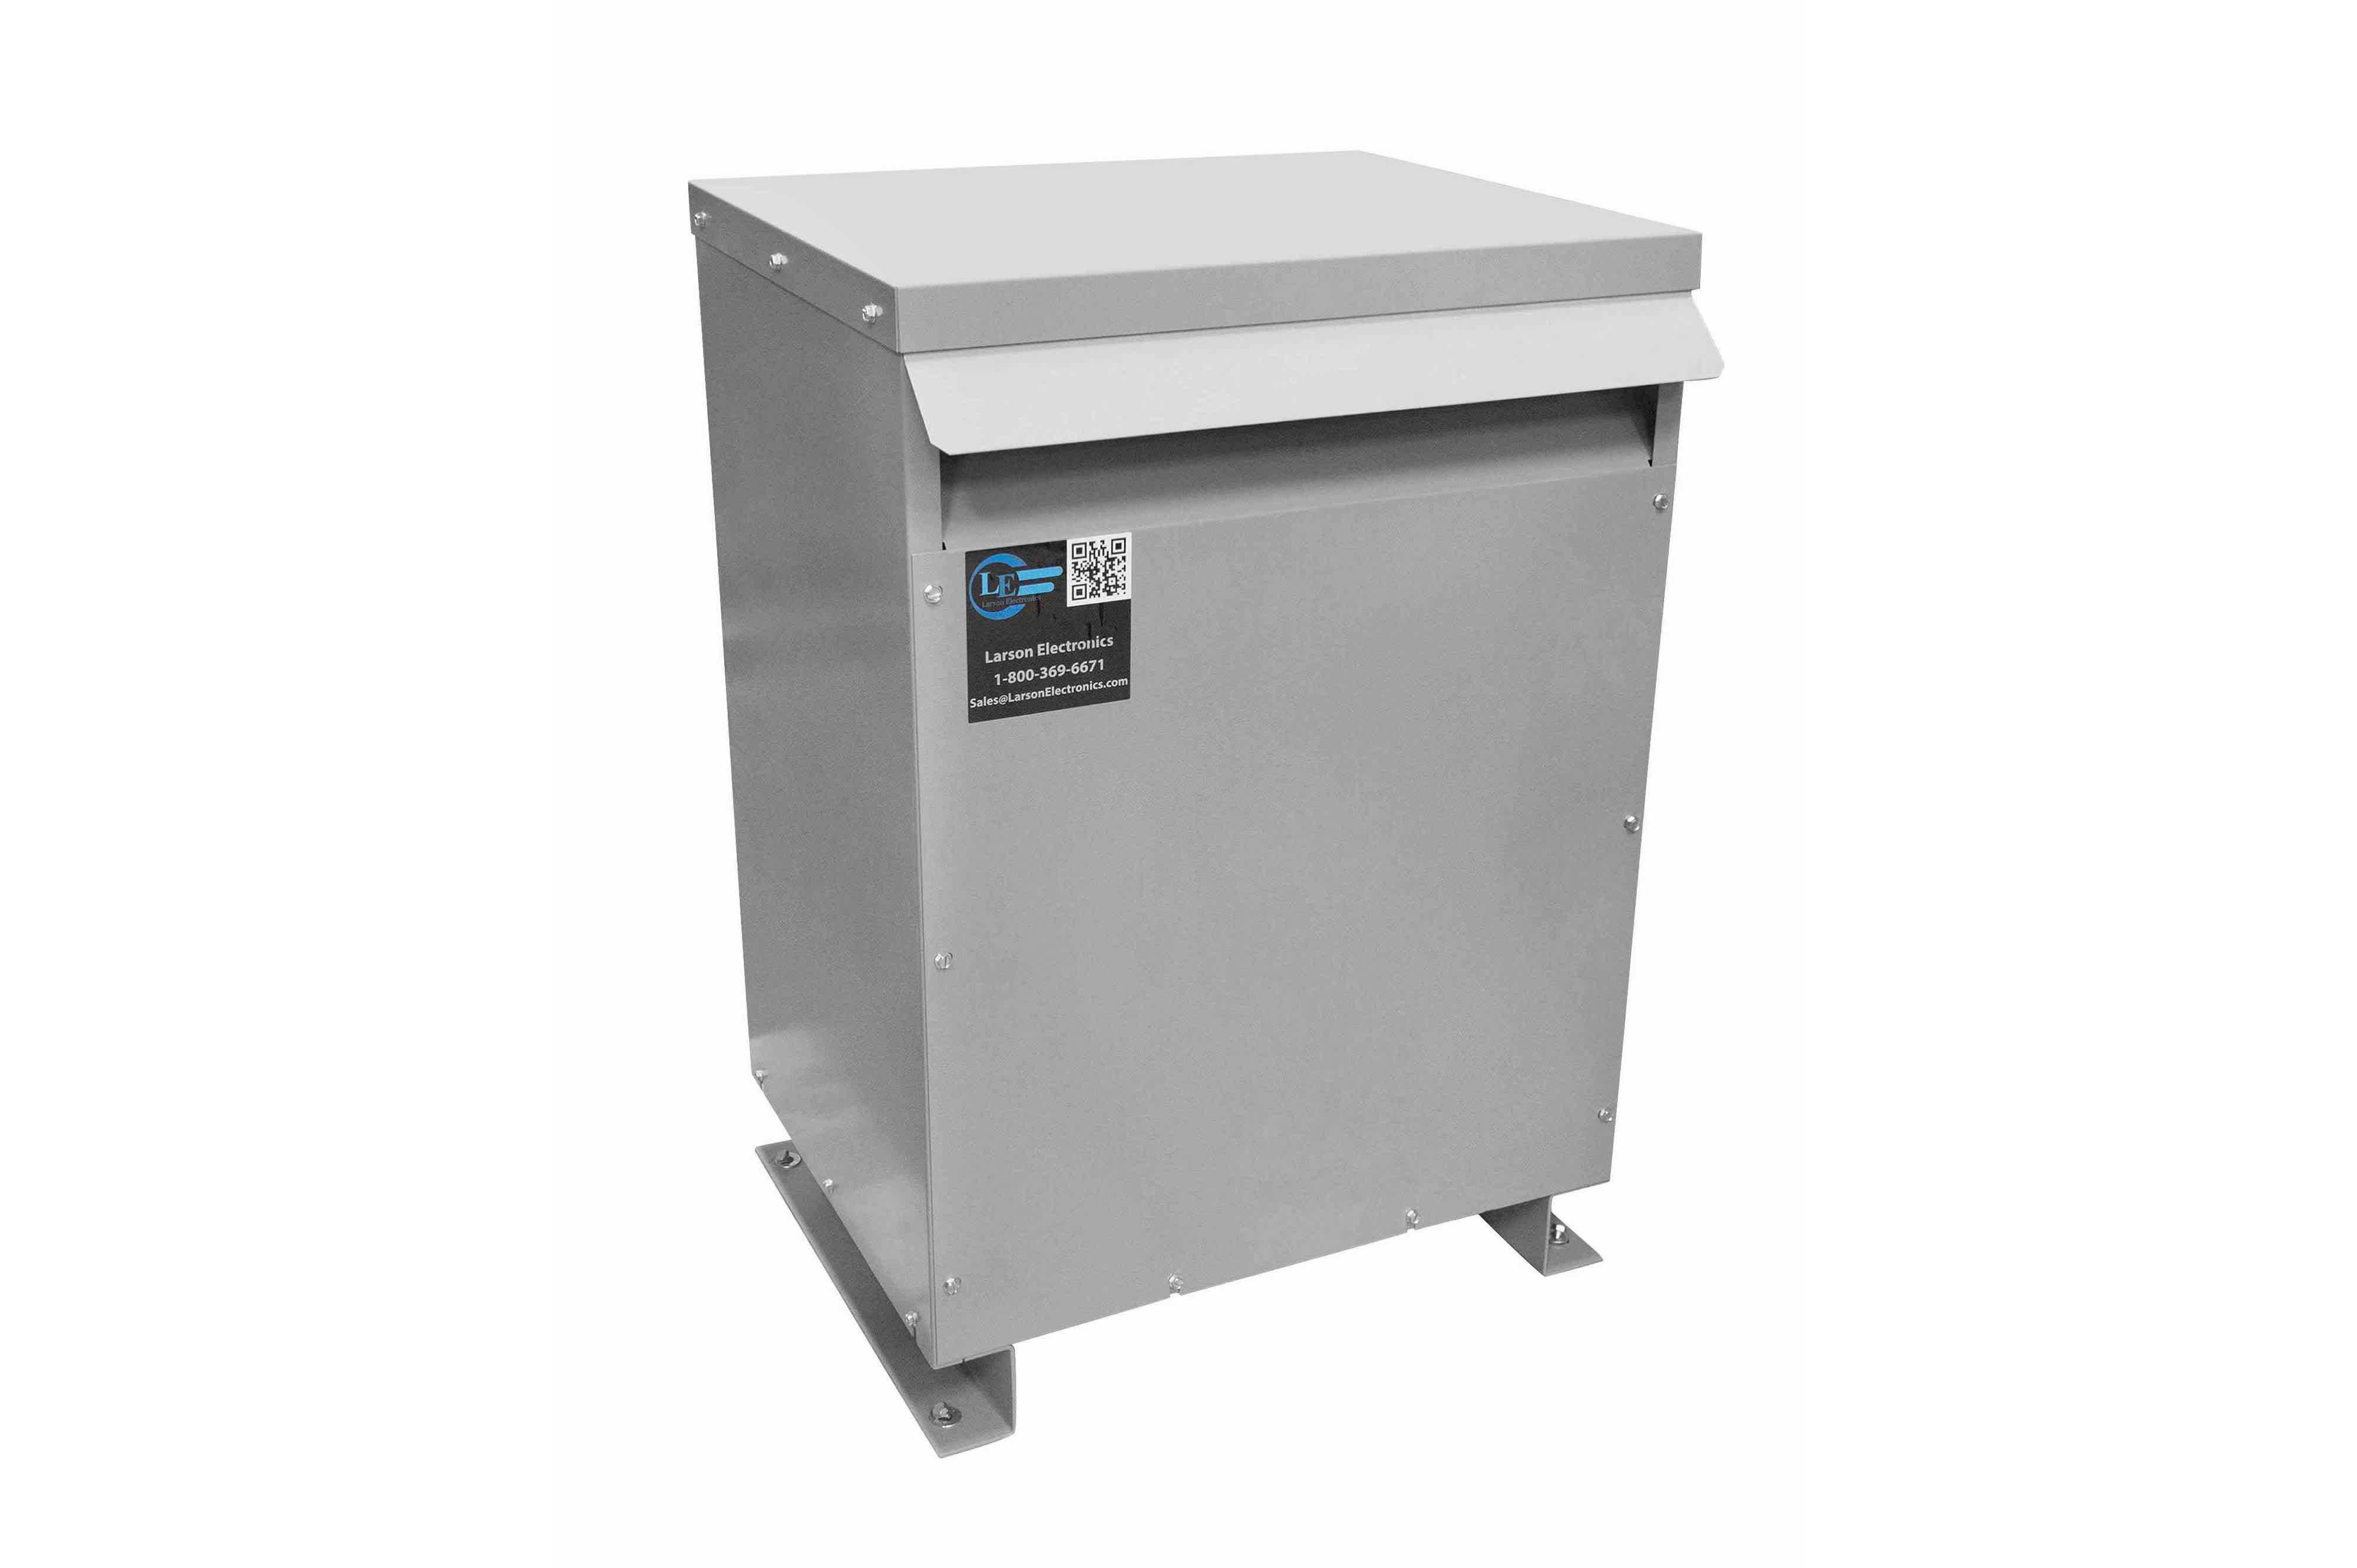 275 kVA 3PH Isolation Transformer, 208V Wye Primary, 380V Delta Secondary, N3R, Ventilated, 60 Hz